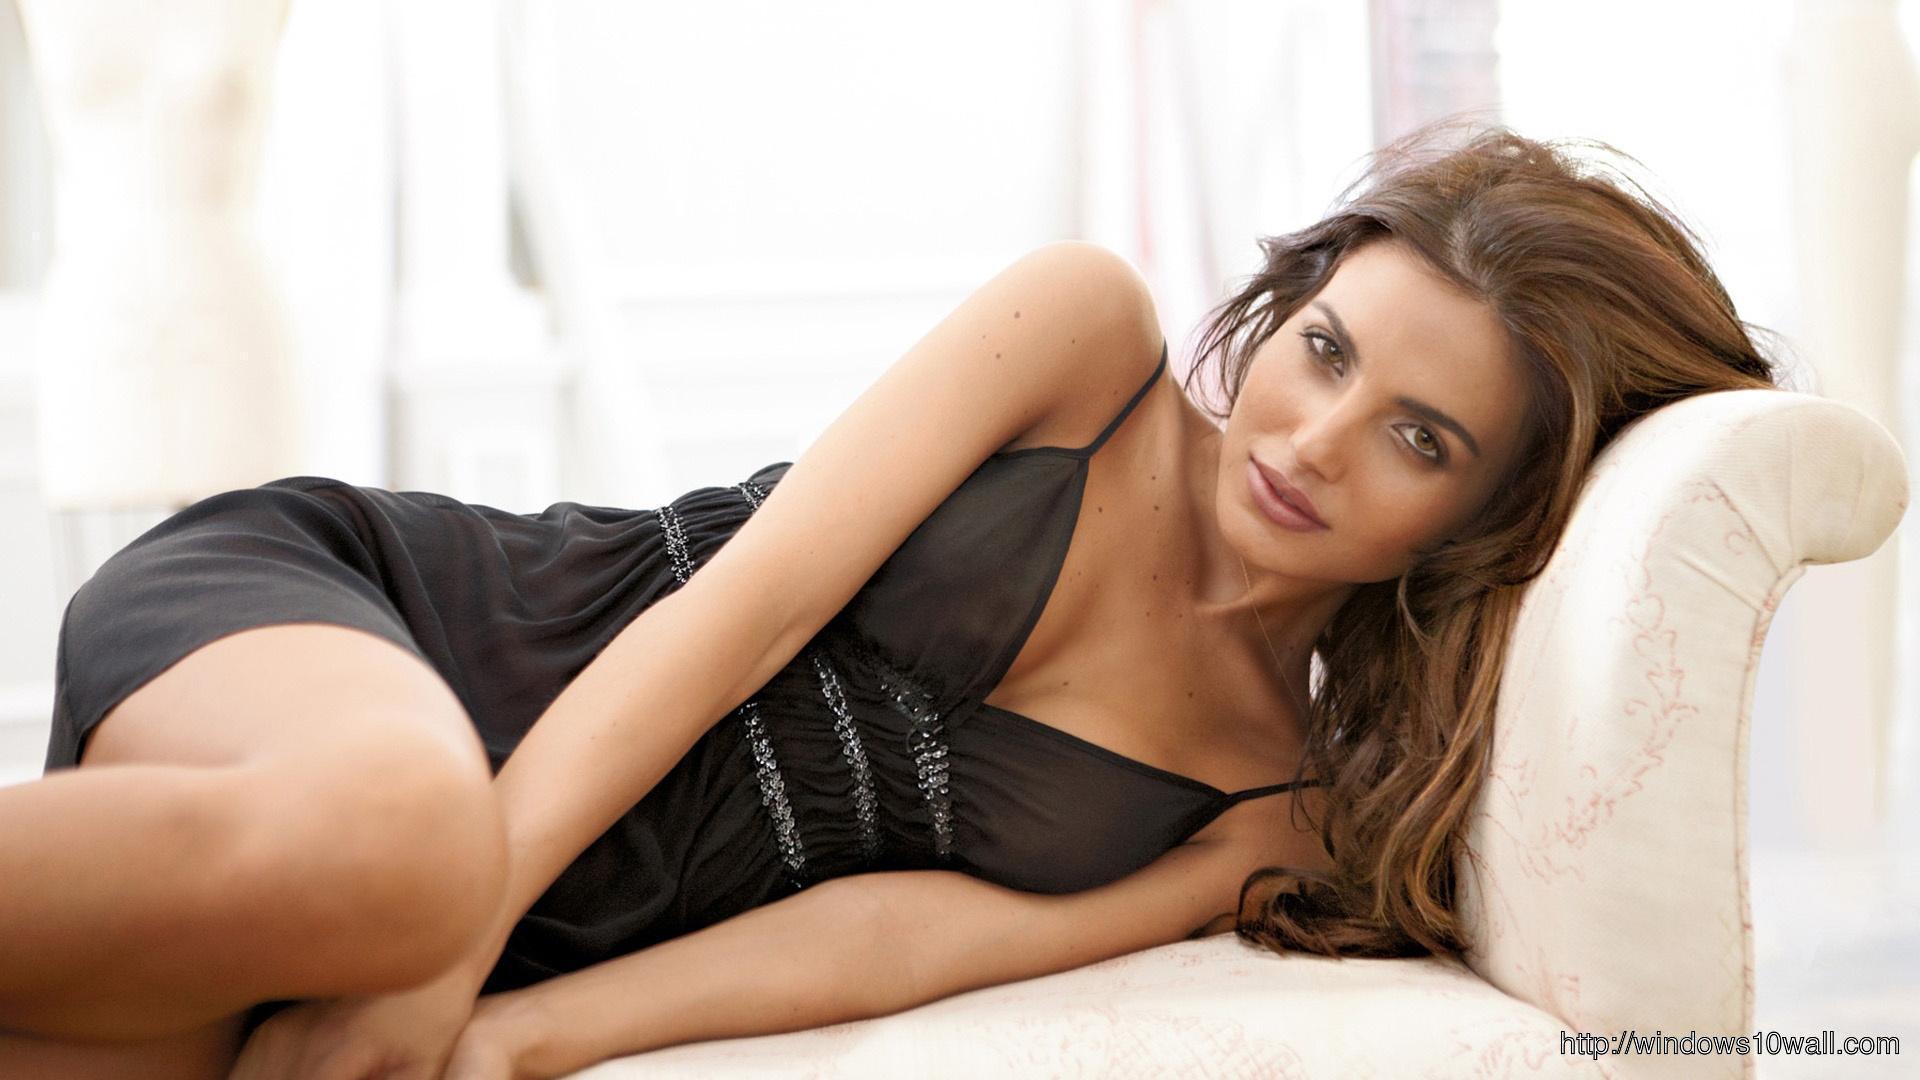 Diana Morales Looks Hot on Sofa wallpaper